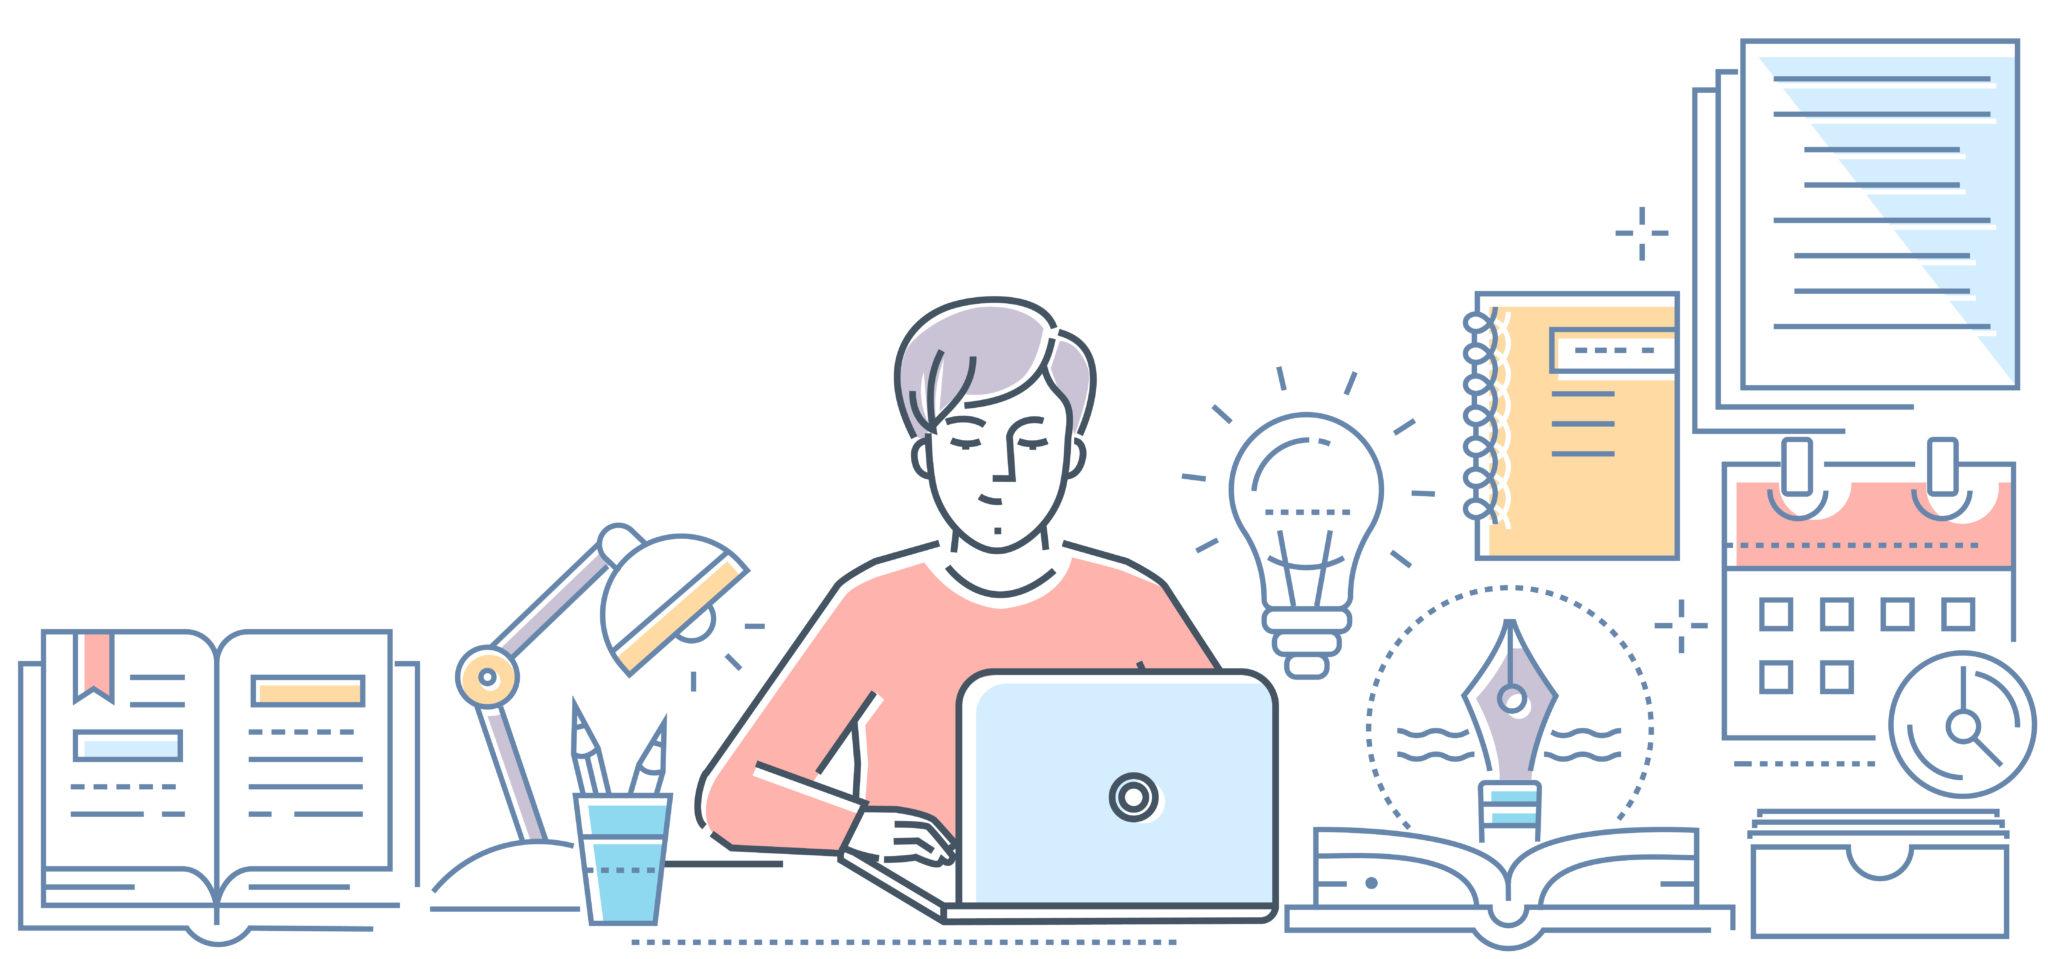 Copywriting and content development